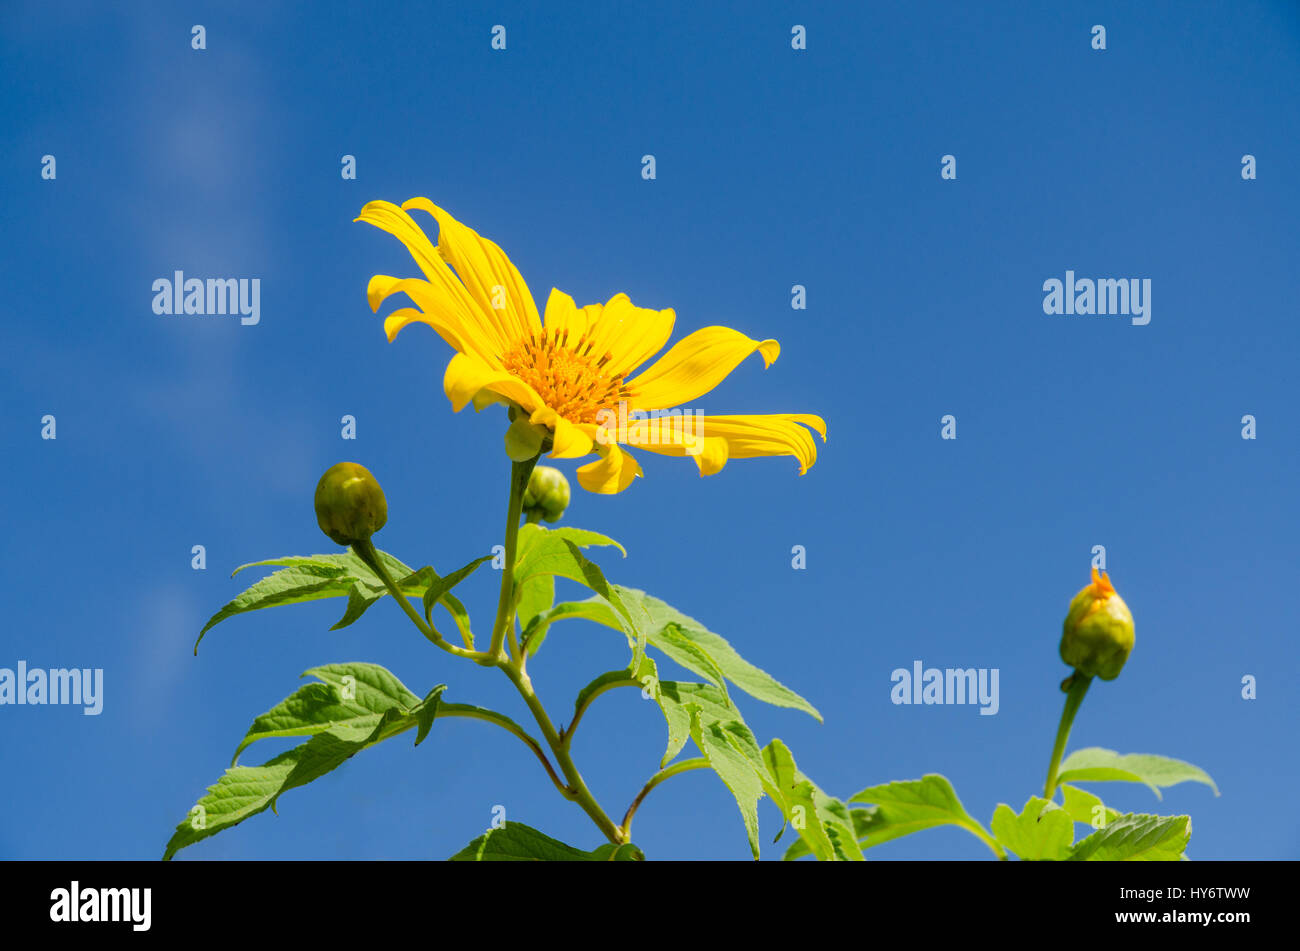 mexican flora stockfotos mexican flora bilder seite 2. Black Bedroom Furniture Sets. Home Design Ideas